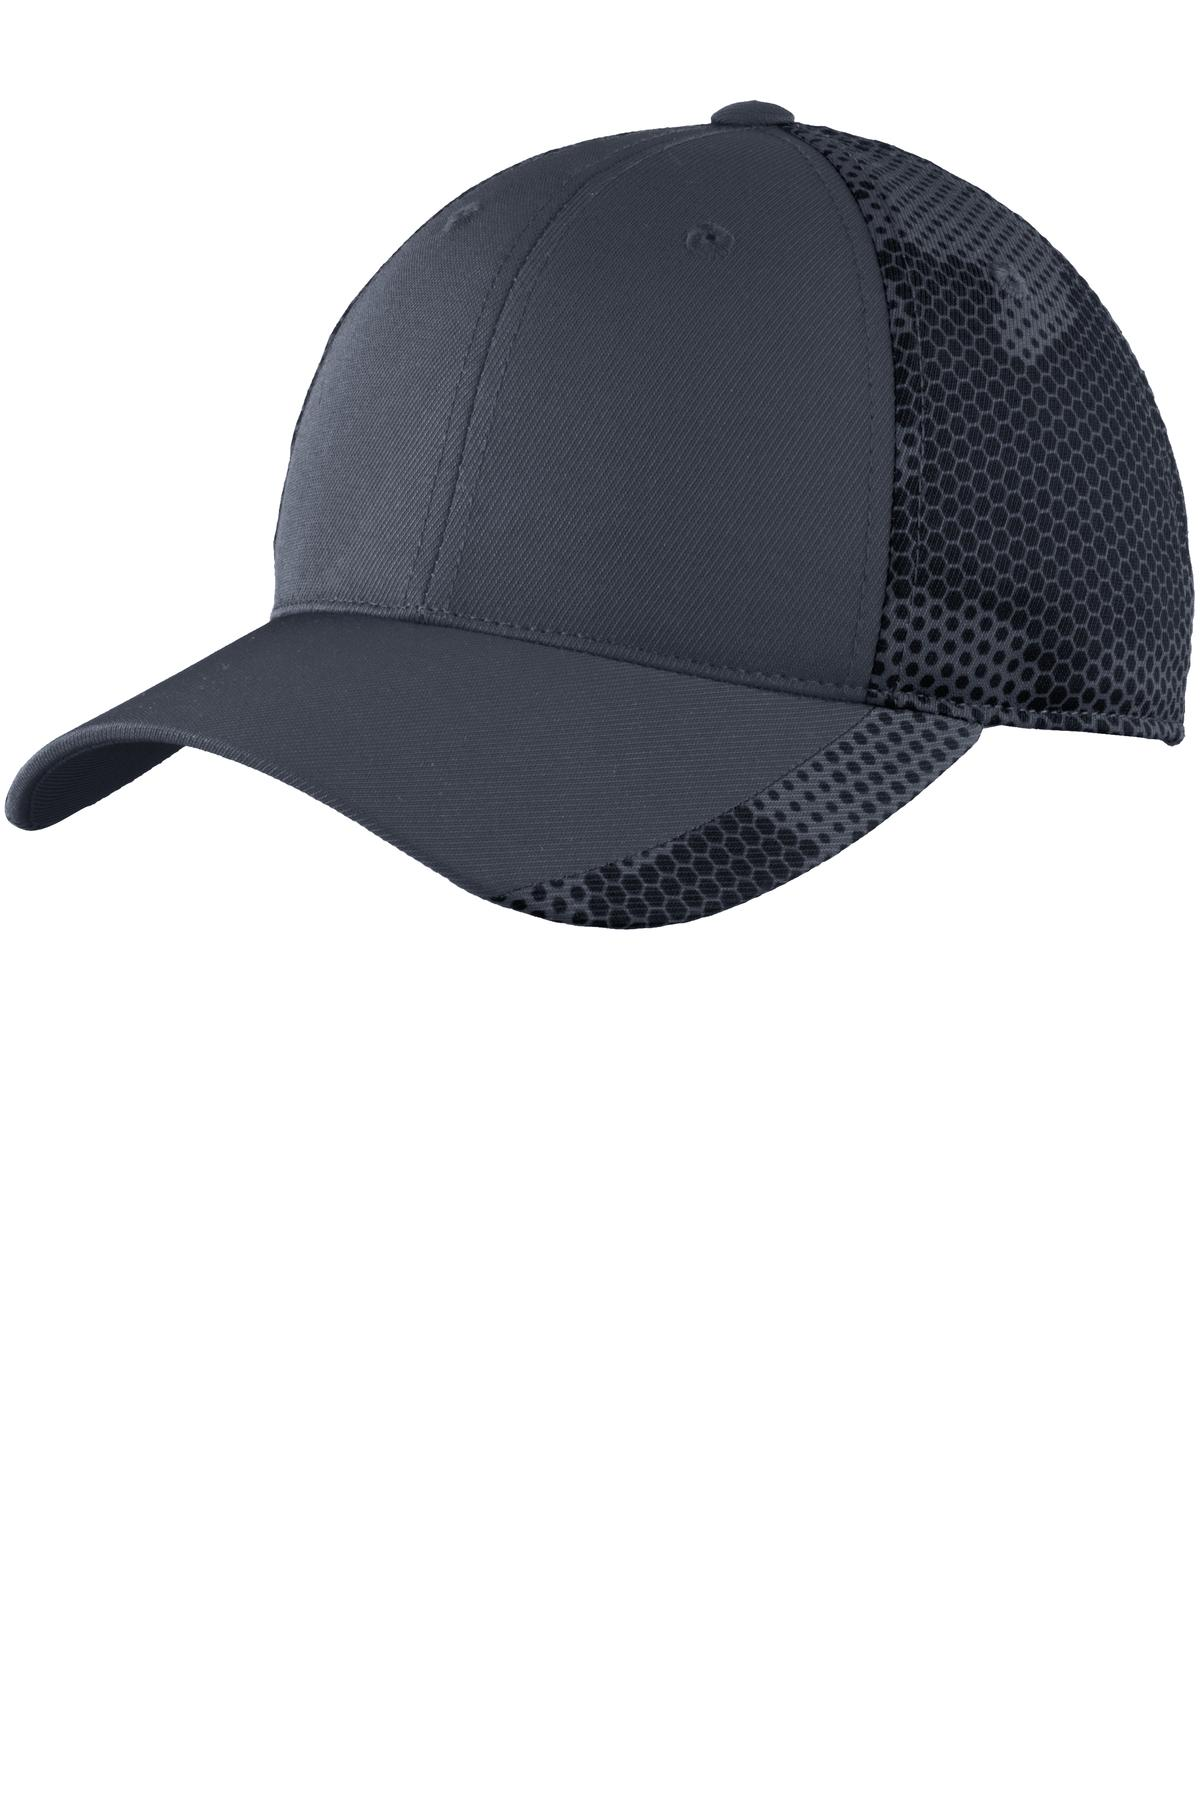 Sport-Tek® STC23 - CamoHex Cap